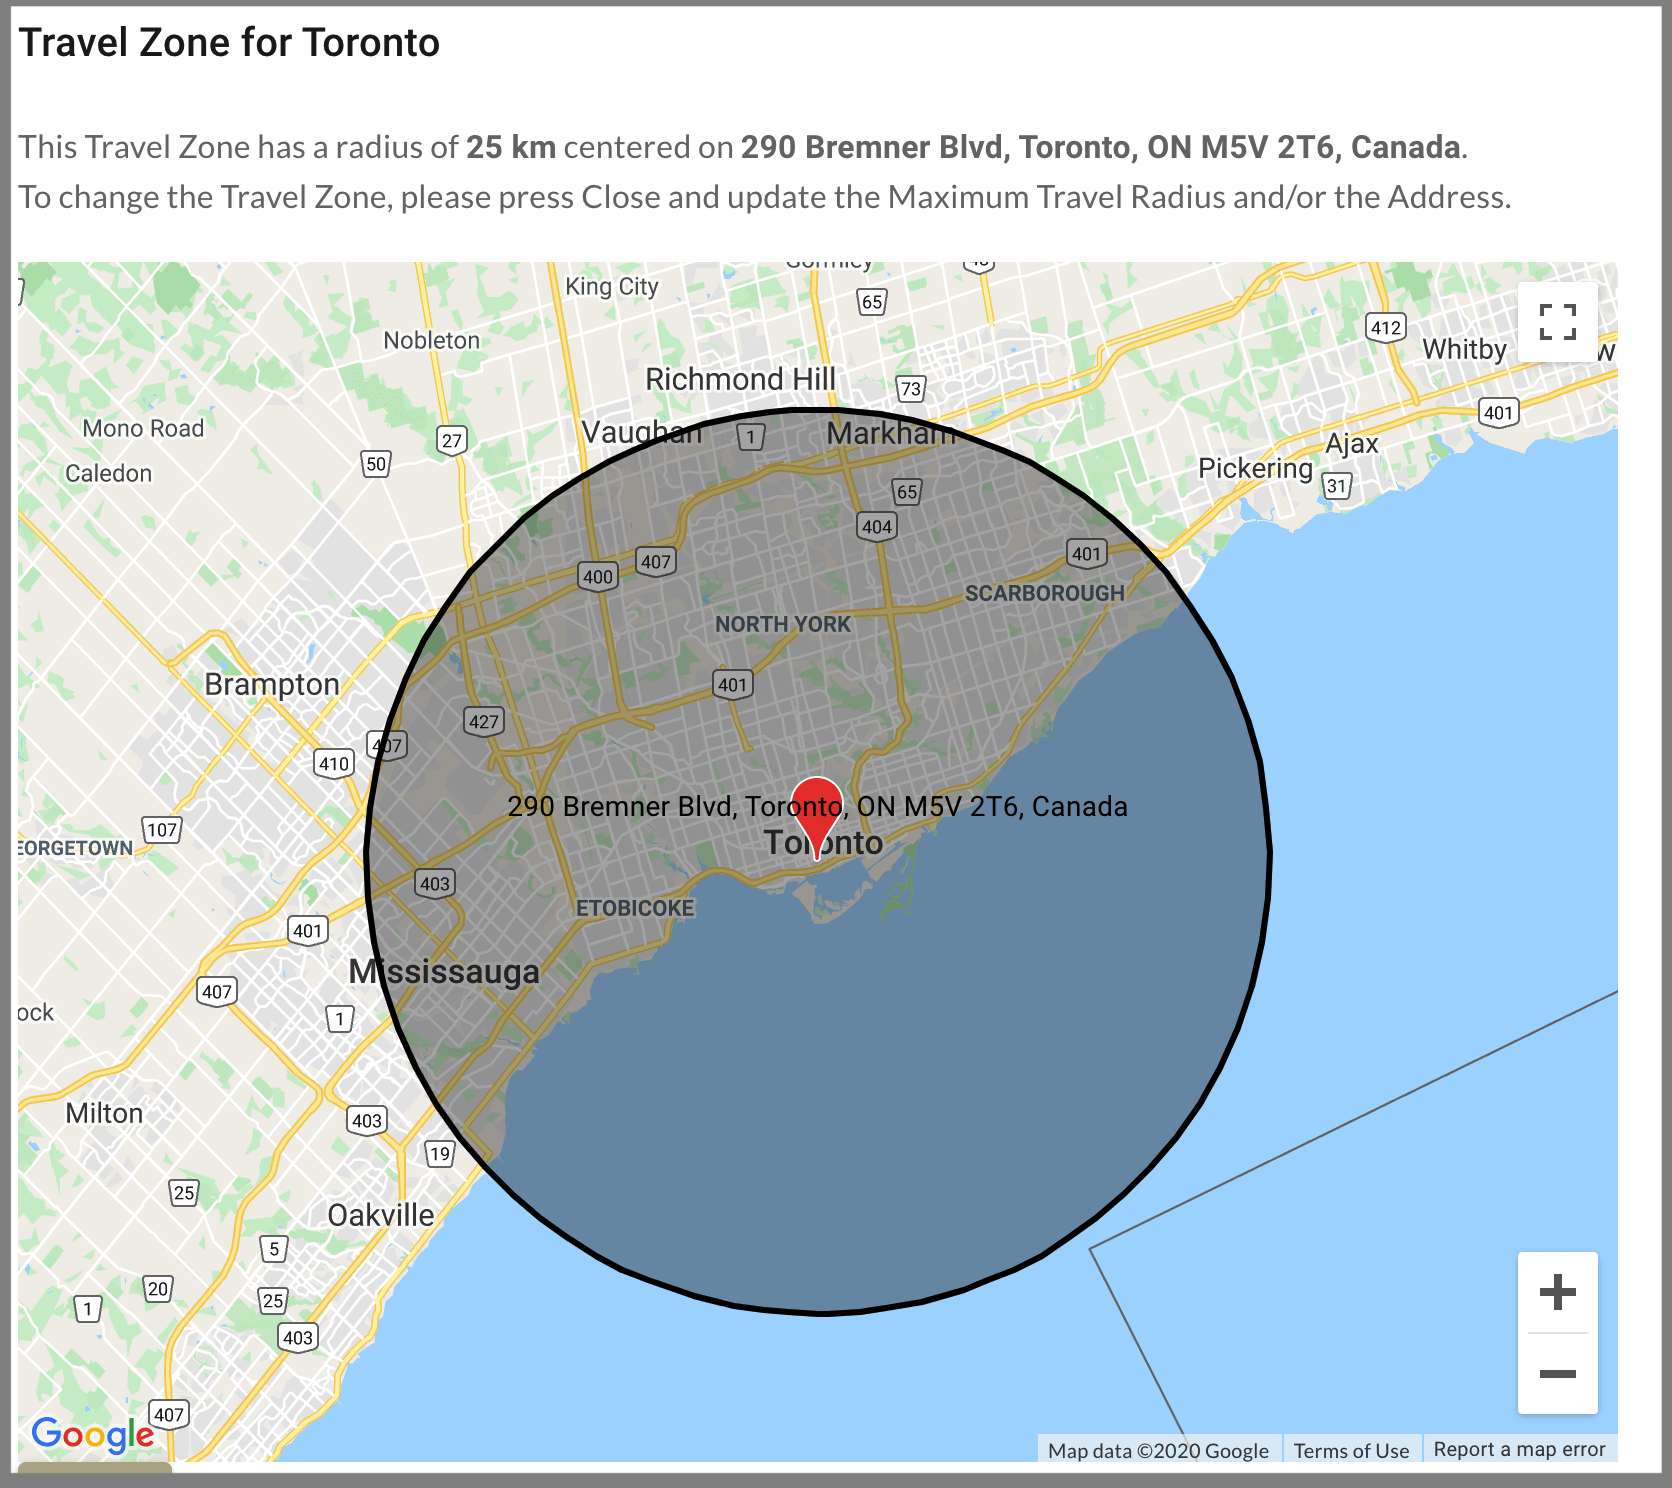 Visual representation of circular travel zone